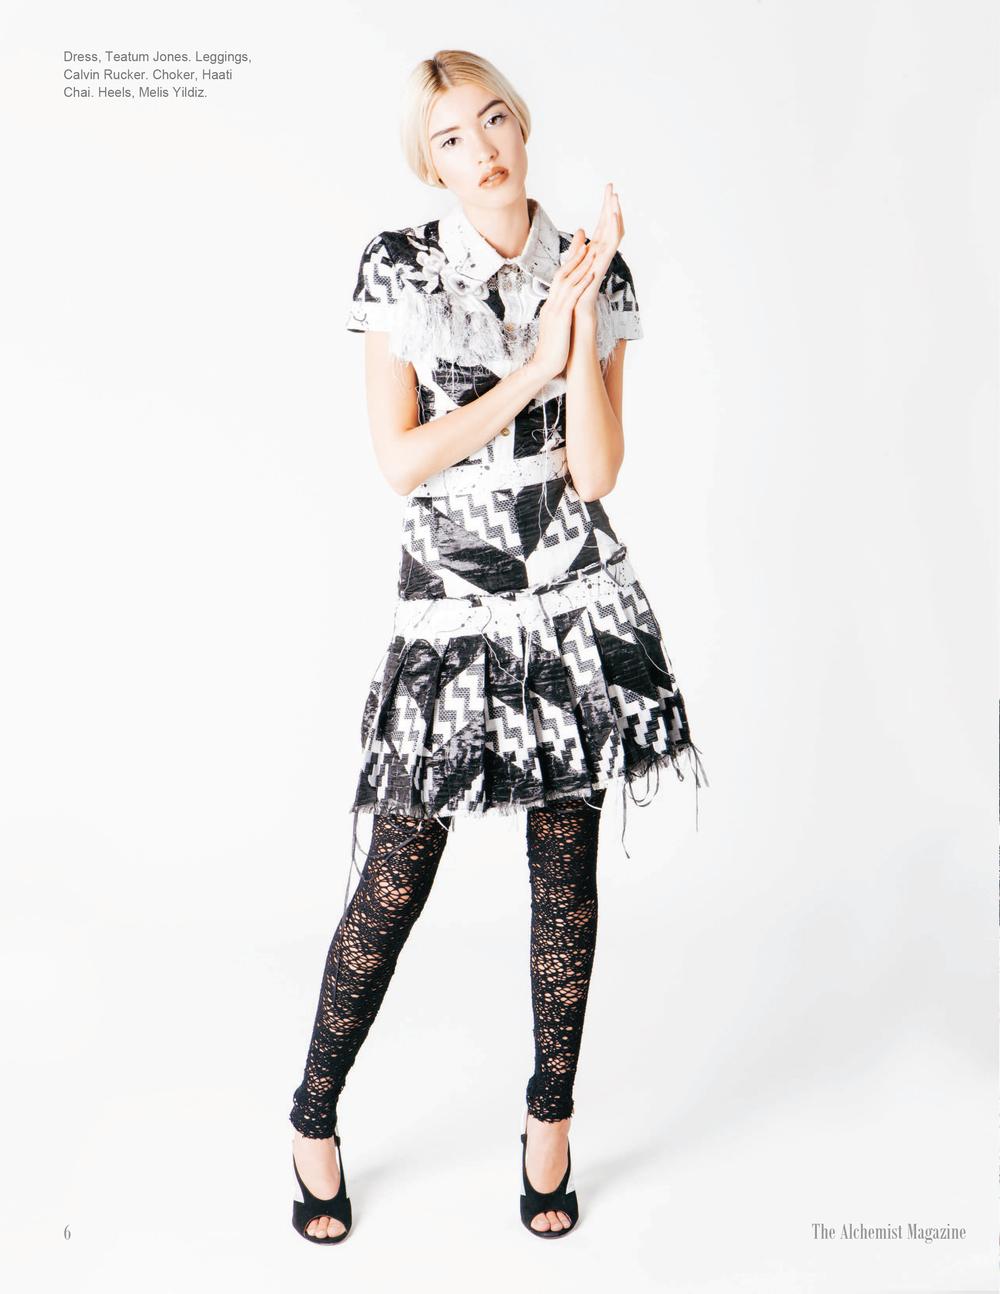 Jessica-Portillo---Alchemist-Magazine-Issue-XIV-Vol-I---Tear-Sheets-6.jpg